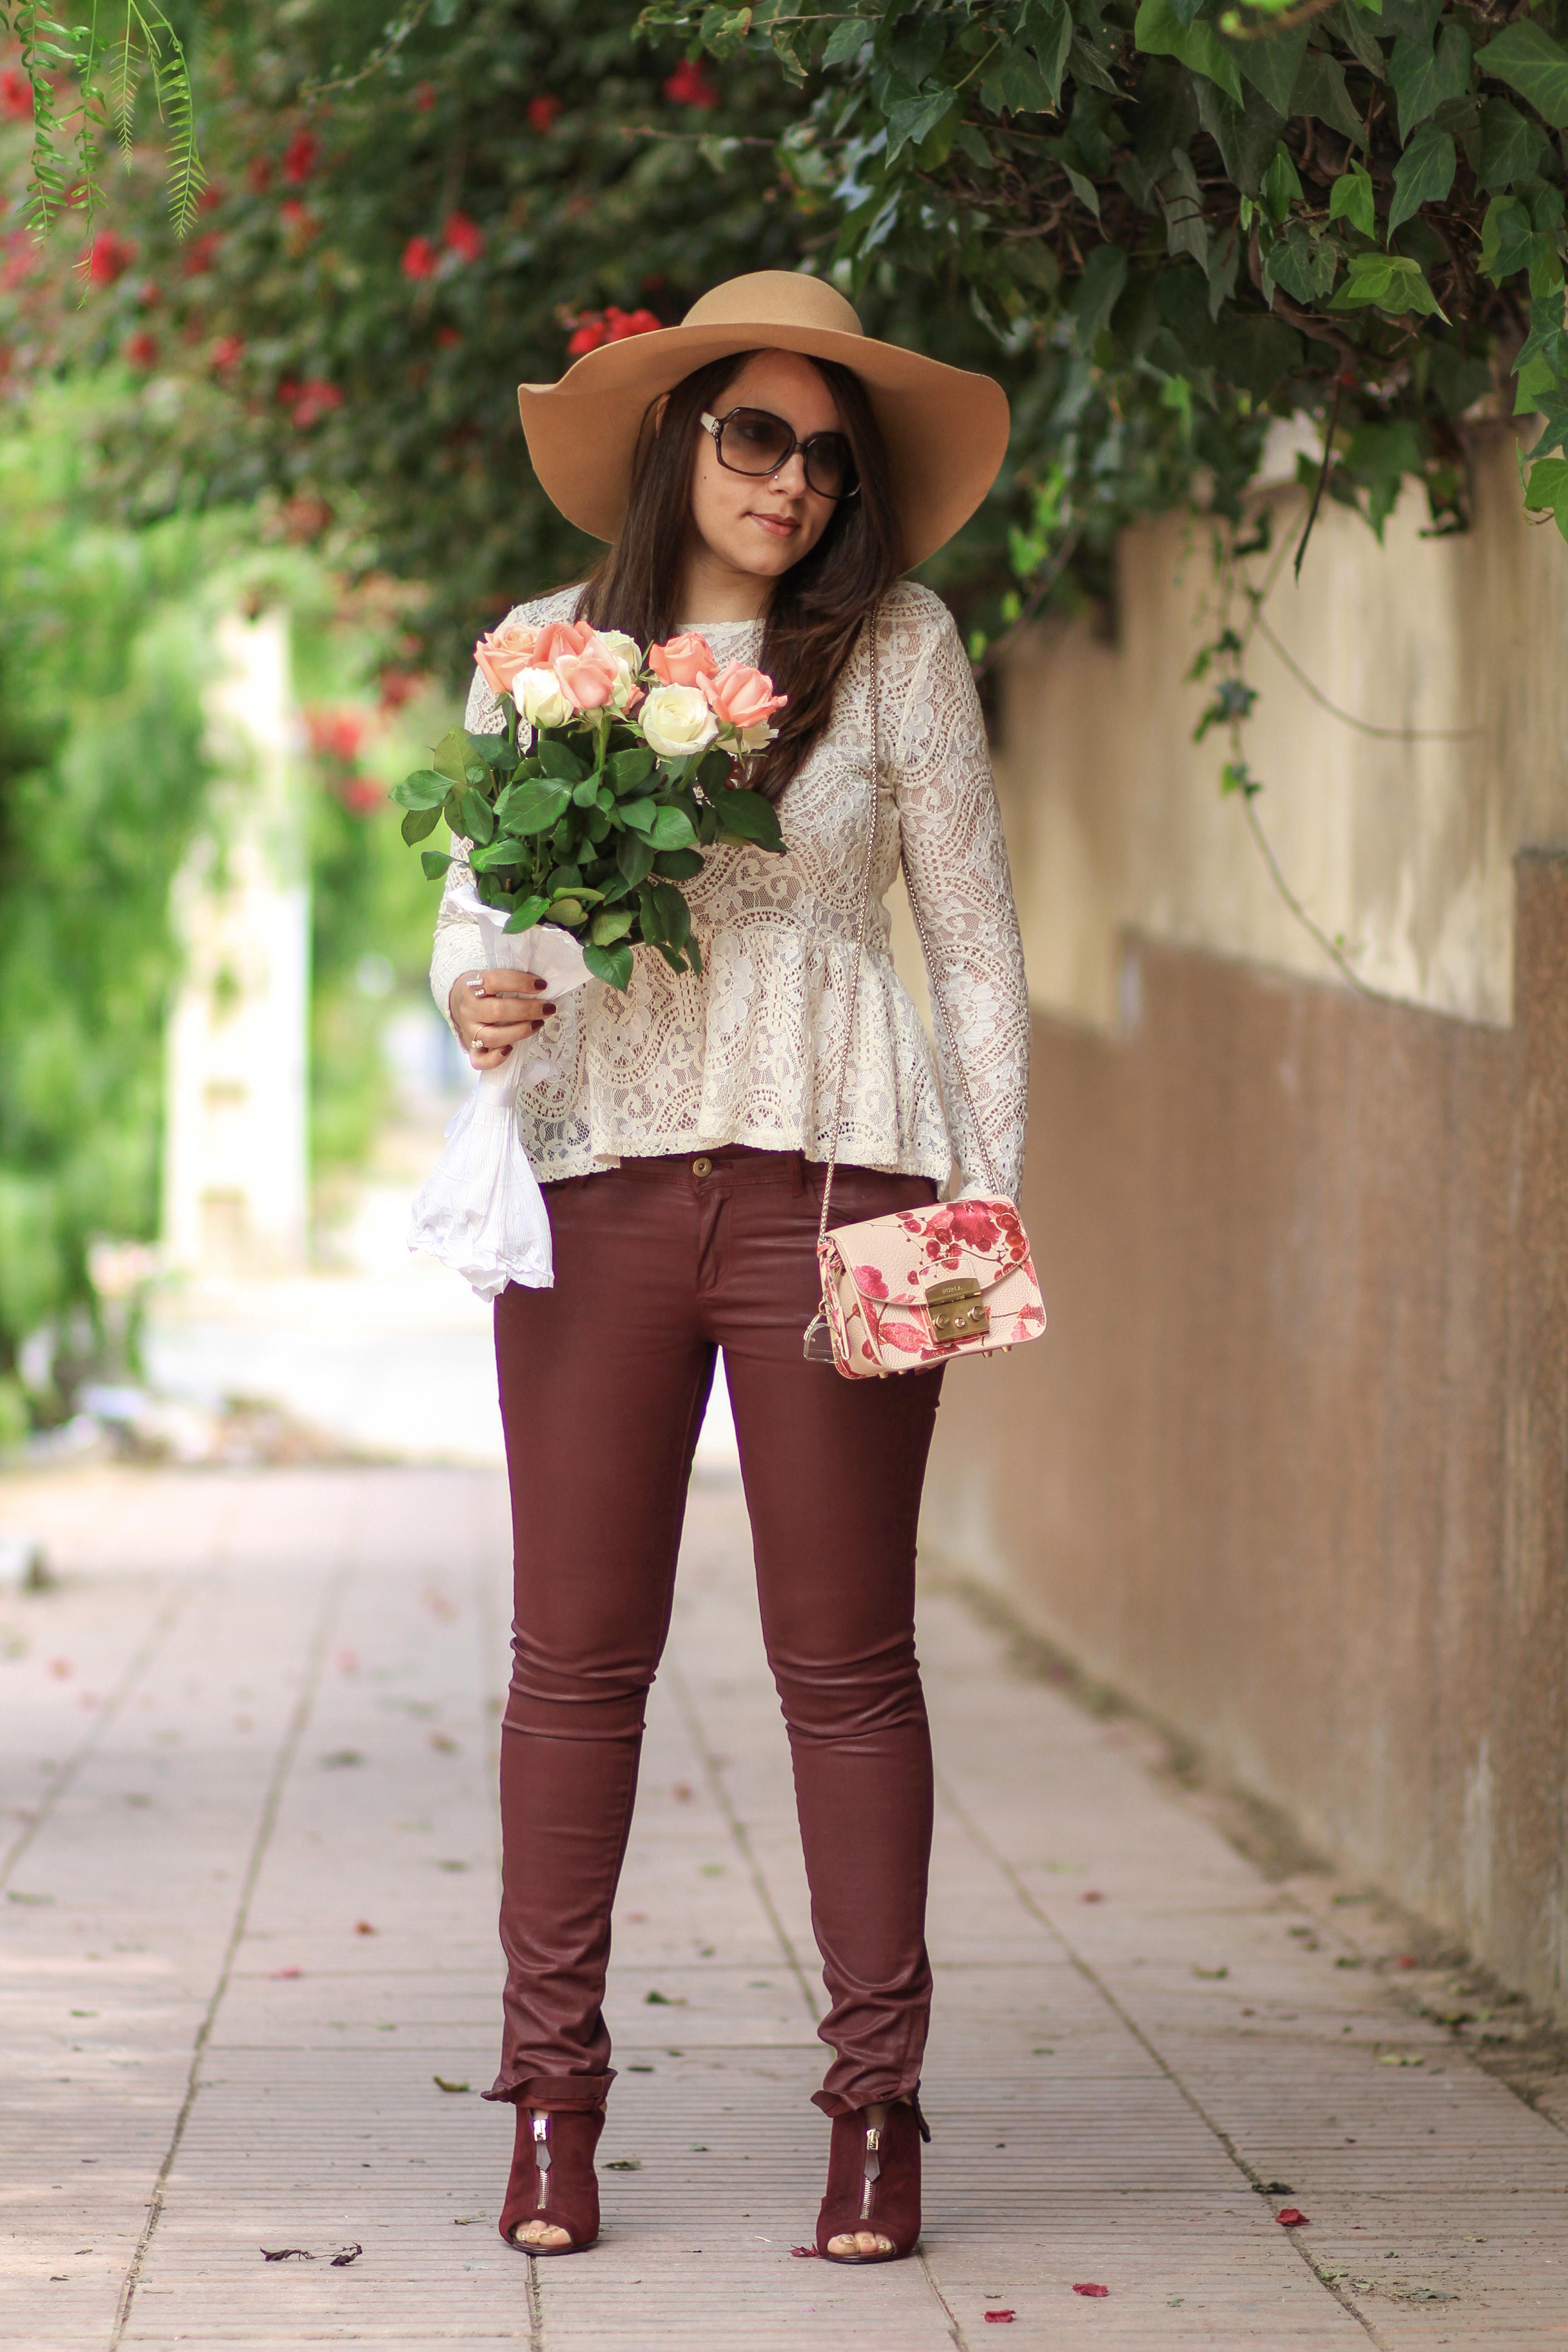 Lace-&-Flowers-mode-blog-chiccarpediem-mode-